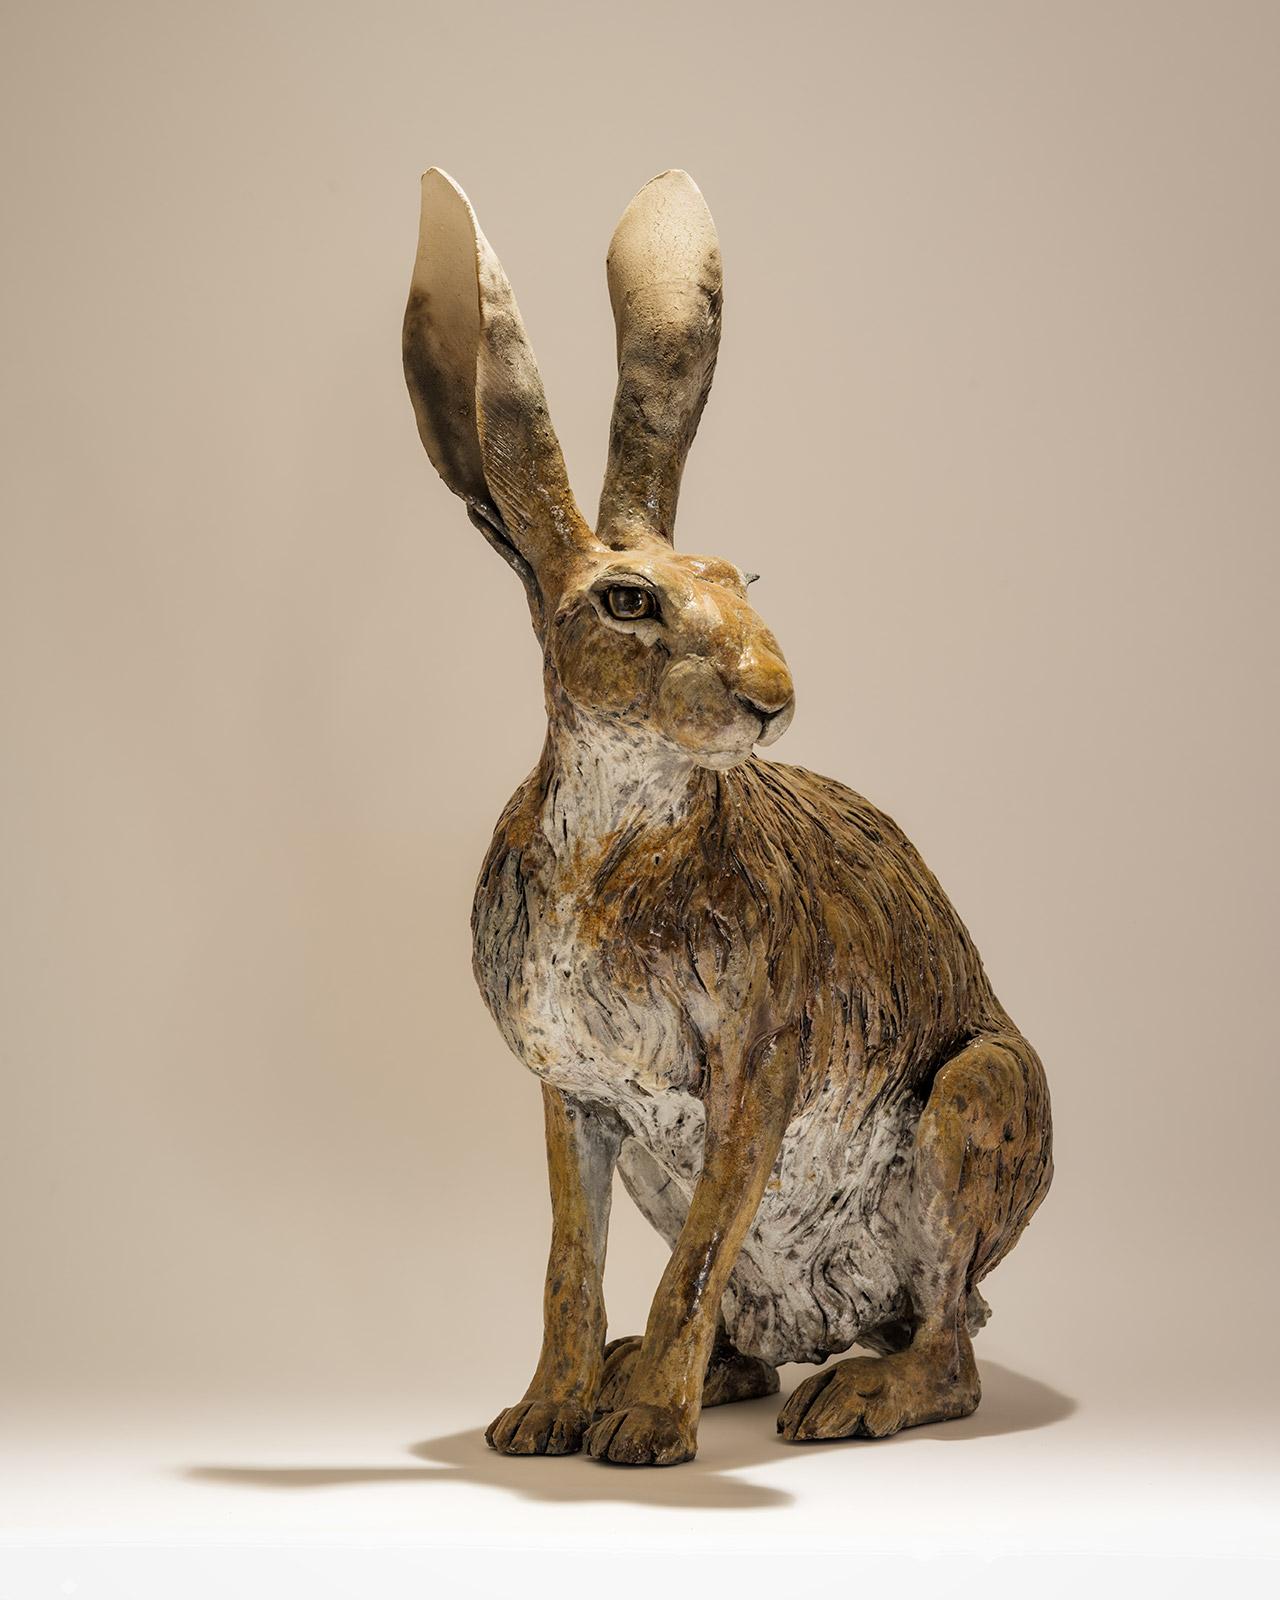 Hare Sculpture (Lockdown Offer) <span>Sold</span>